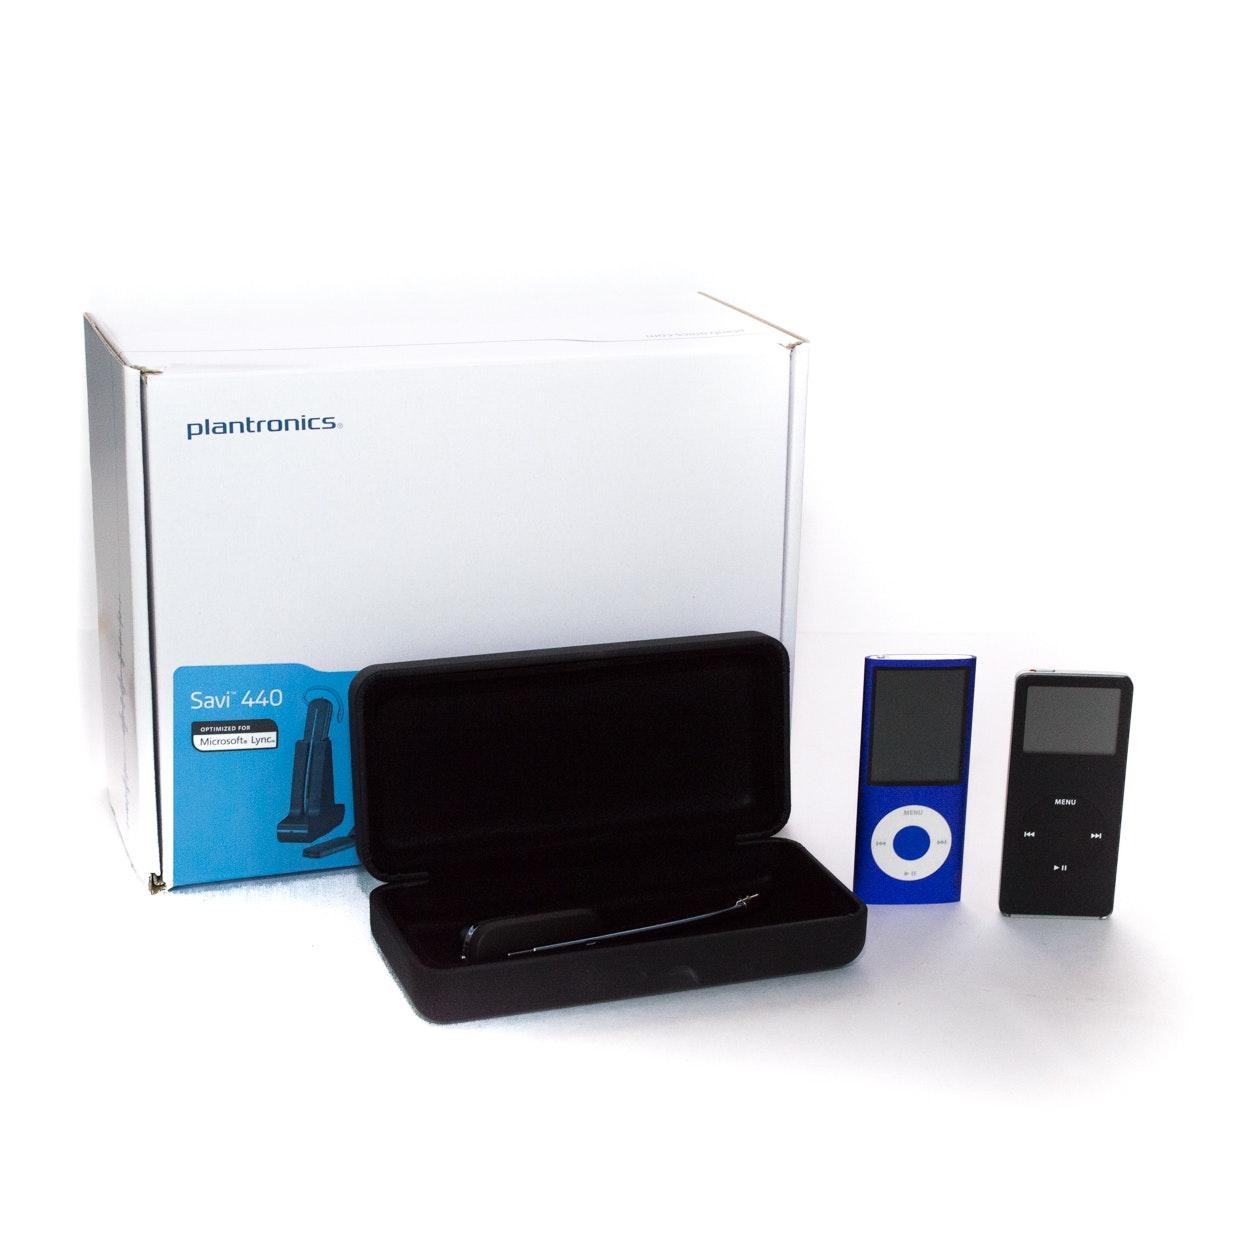 Plantronics Savi Wireless Headset System and iPods